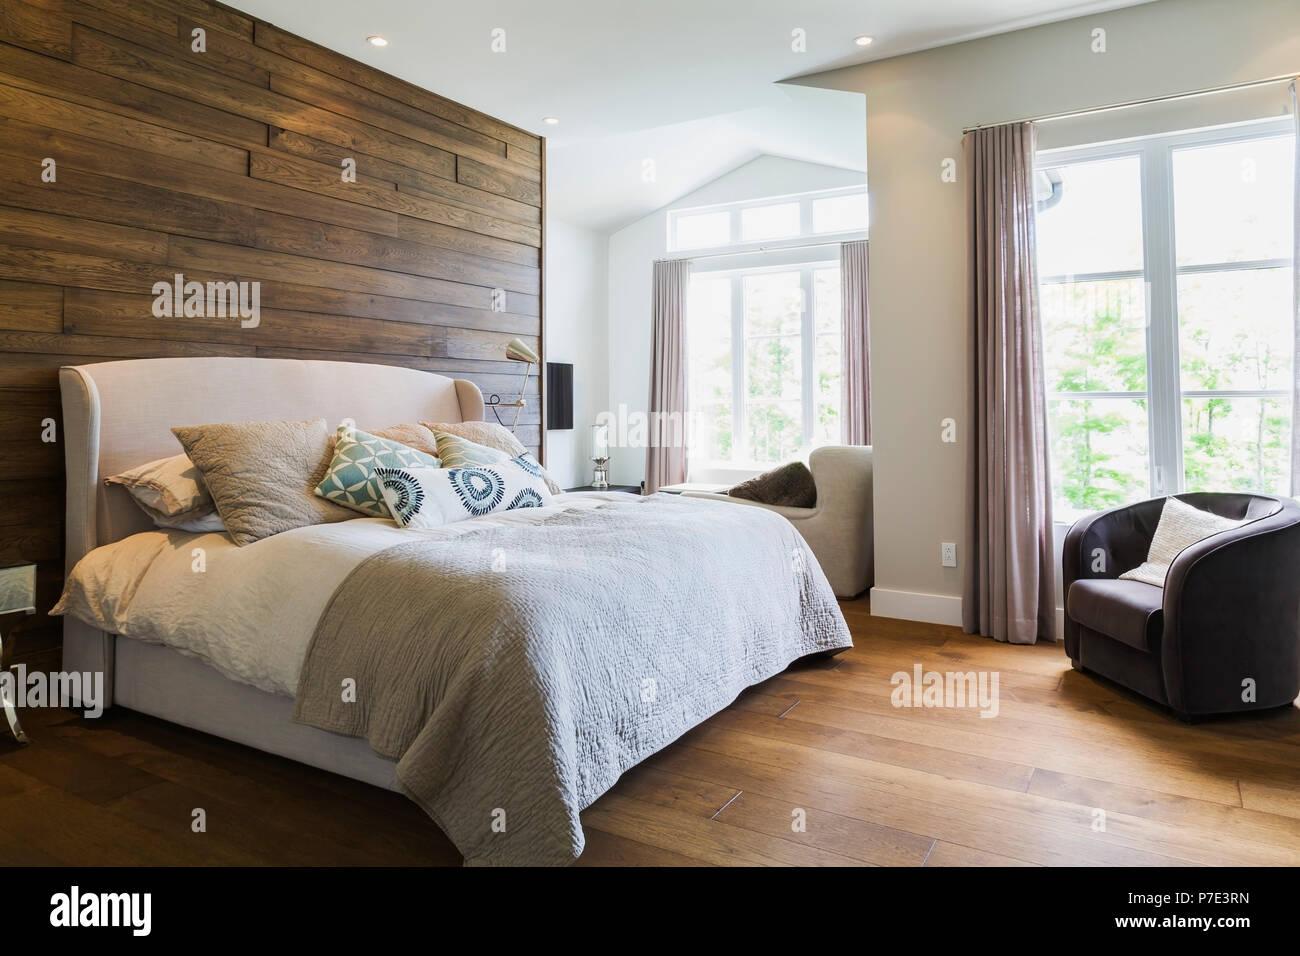 King Size Bett Im Schlafzimmer Mit Hickory Holz Dielen Stockfotografie Alamy